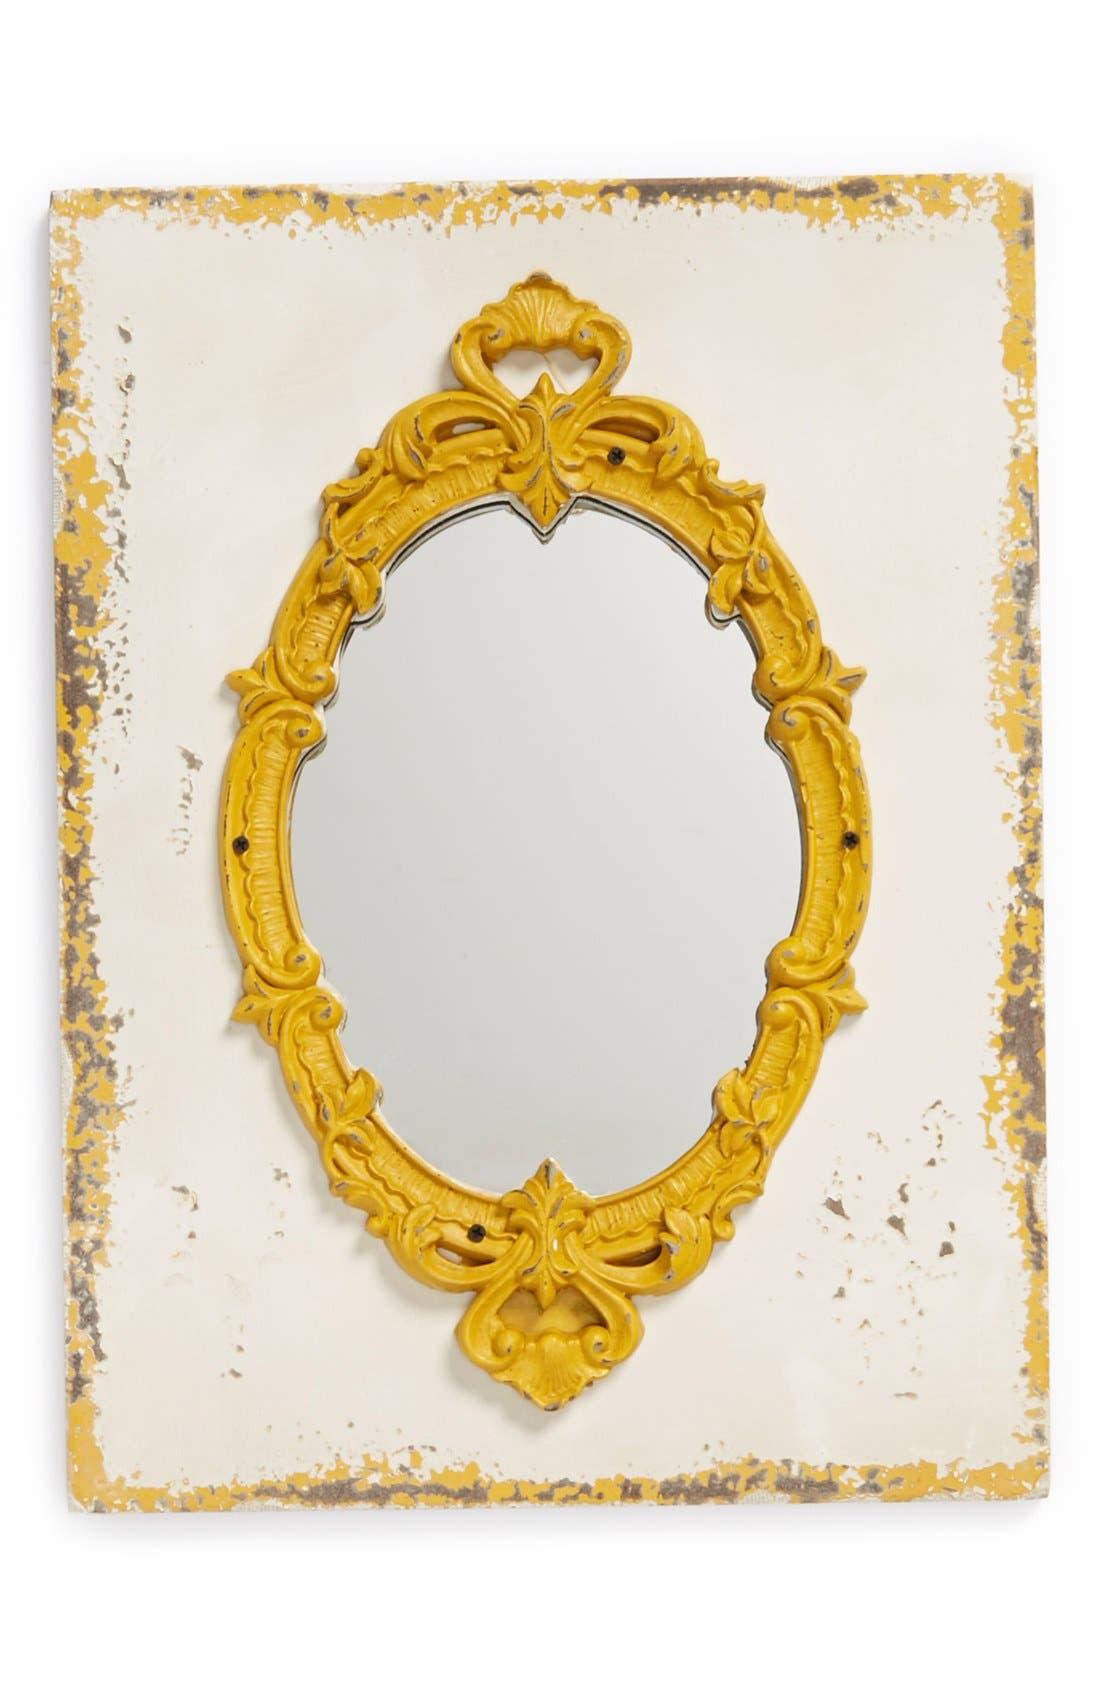 Main Image - VIP International Rustic Wood Mounted Mirror